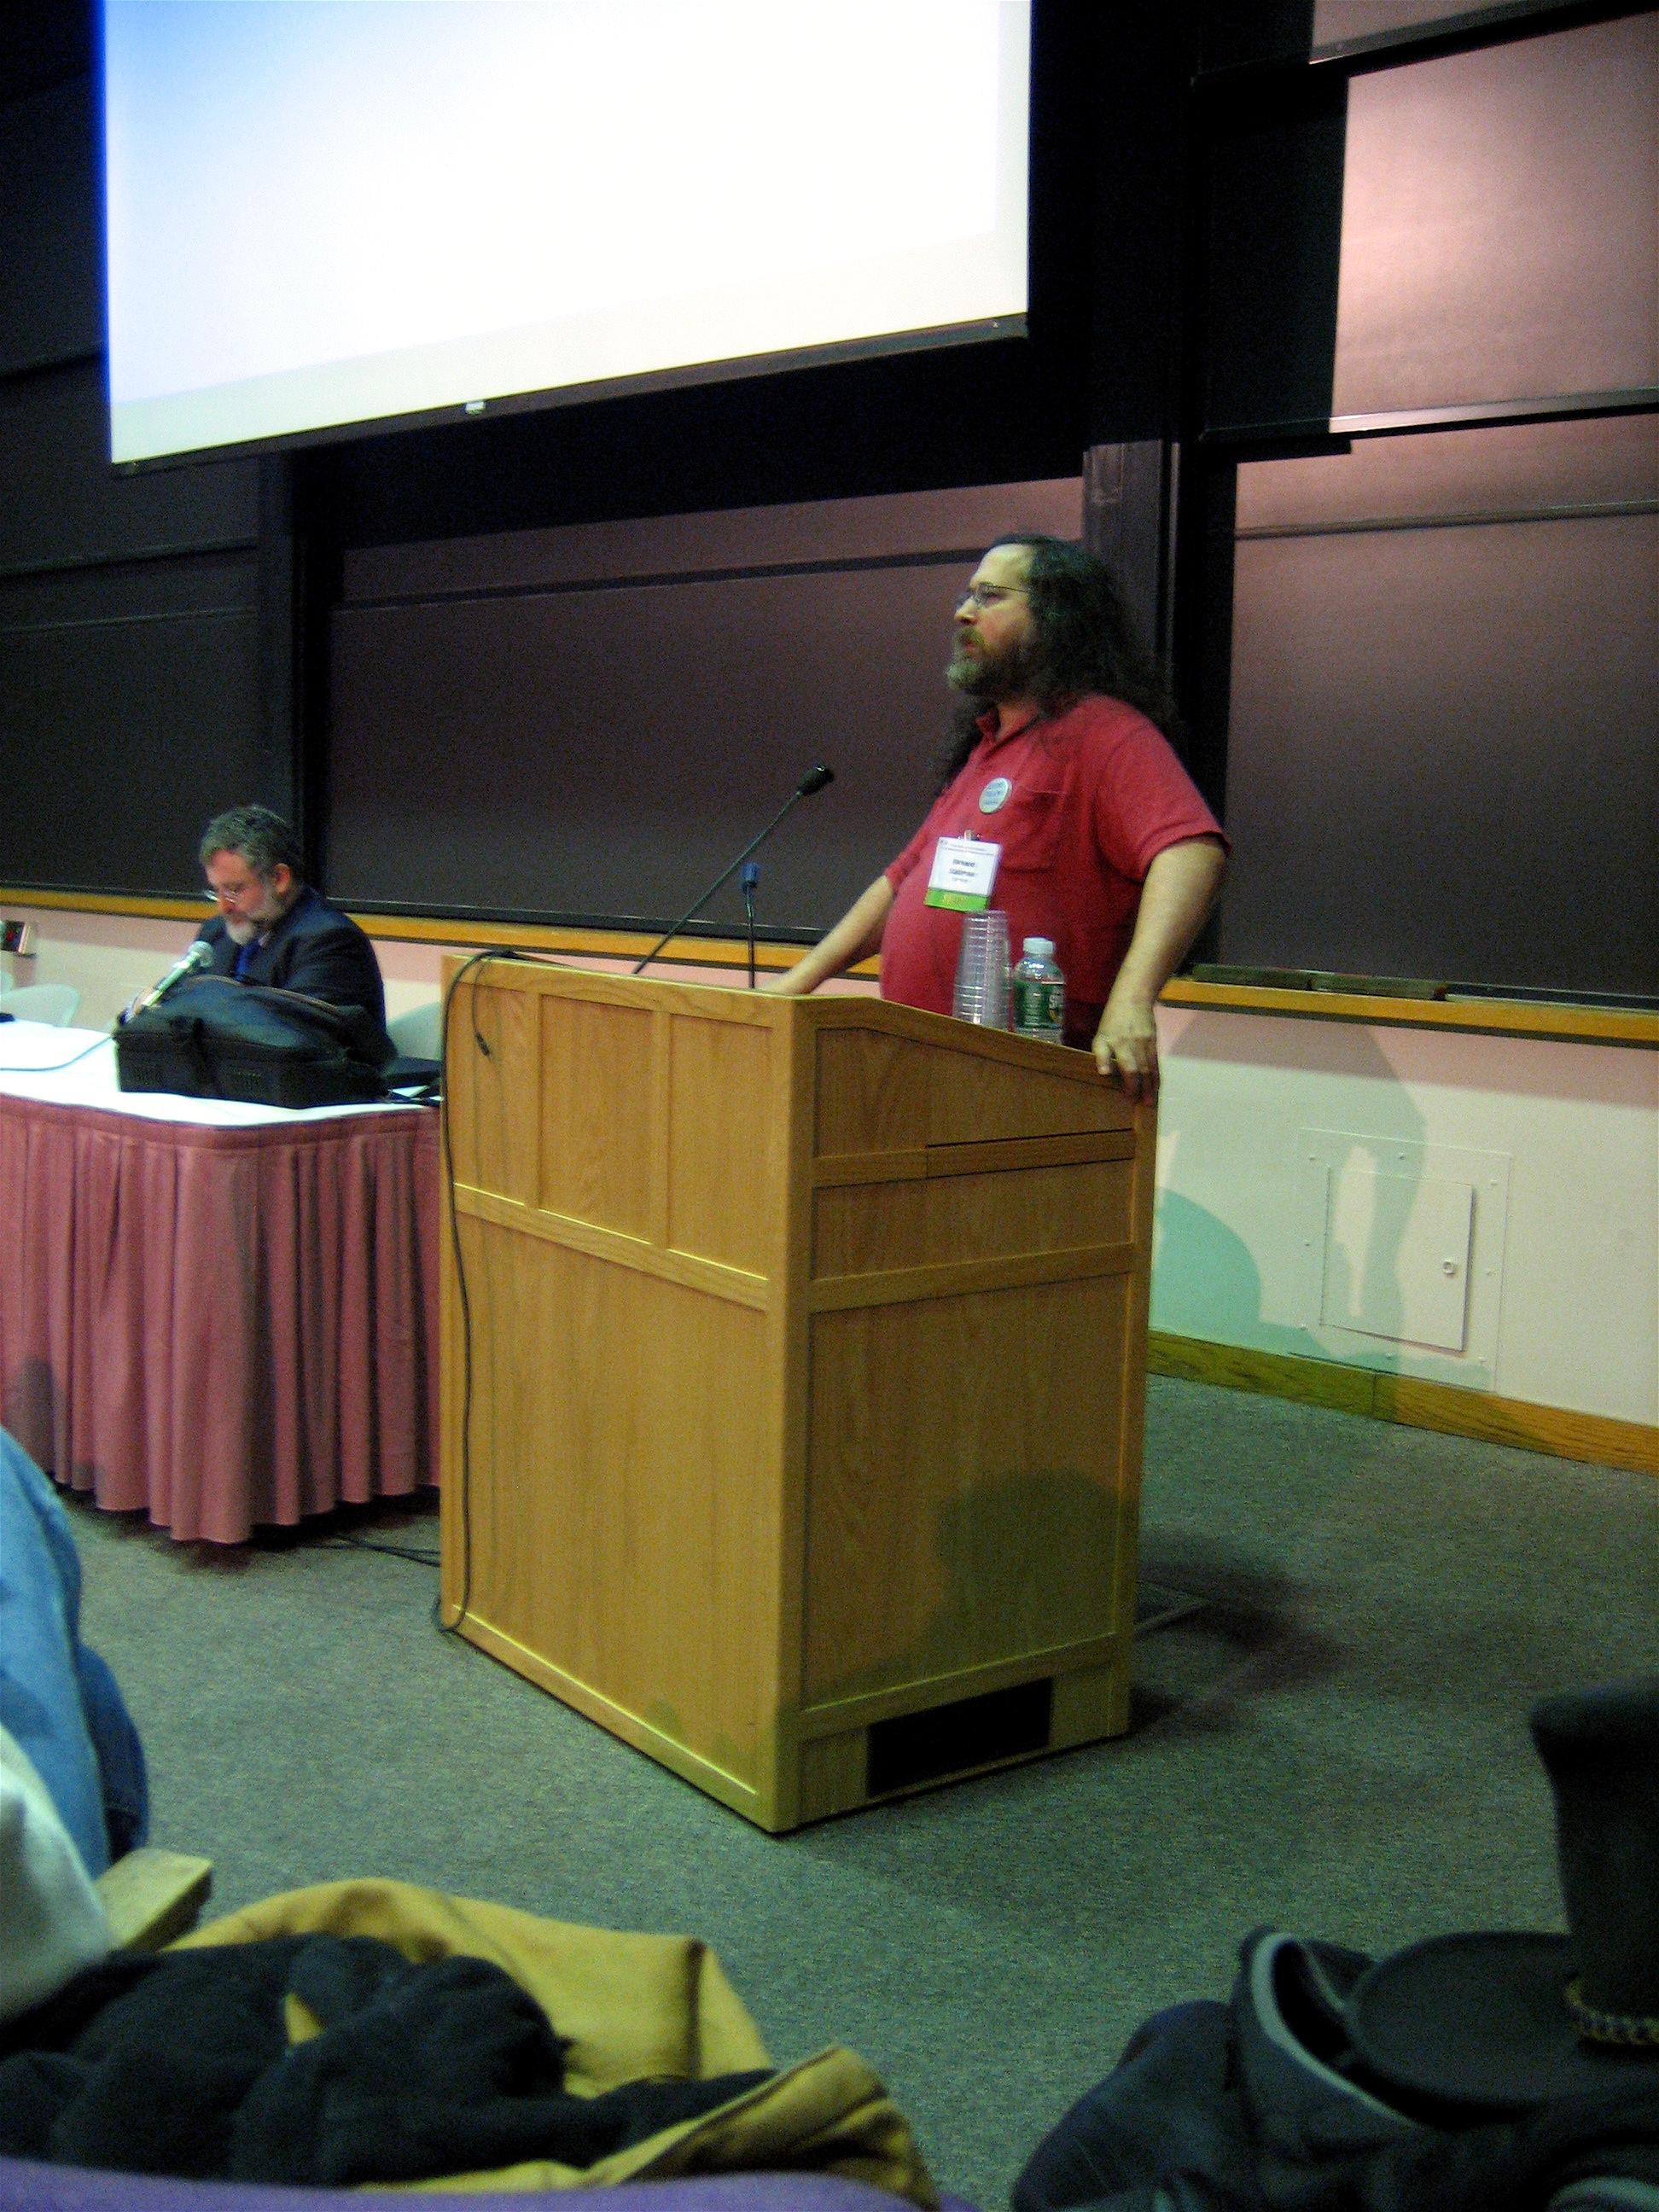 gnu general public license 2010-2-2 gnu general public license (gpl) gpl是很多开源软件使用的license,包括大名鼎鼎的linux。gpl一个特征是开发者做任何的更改都需要回馈社区,所以商业开发不.